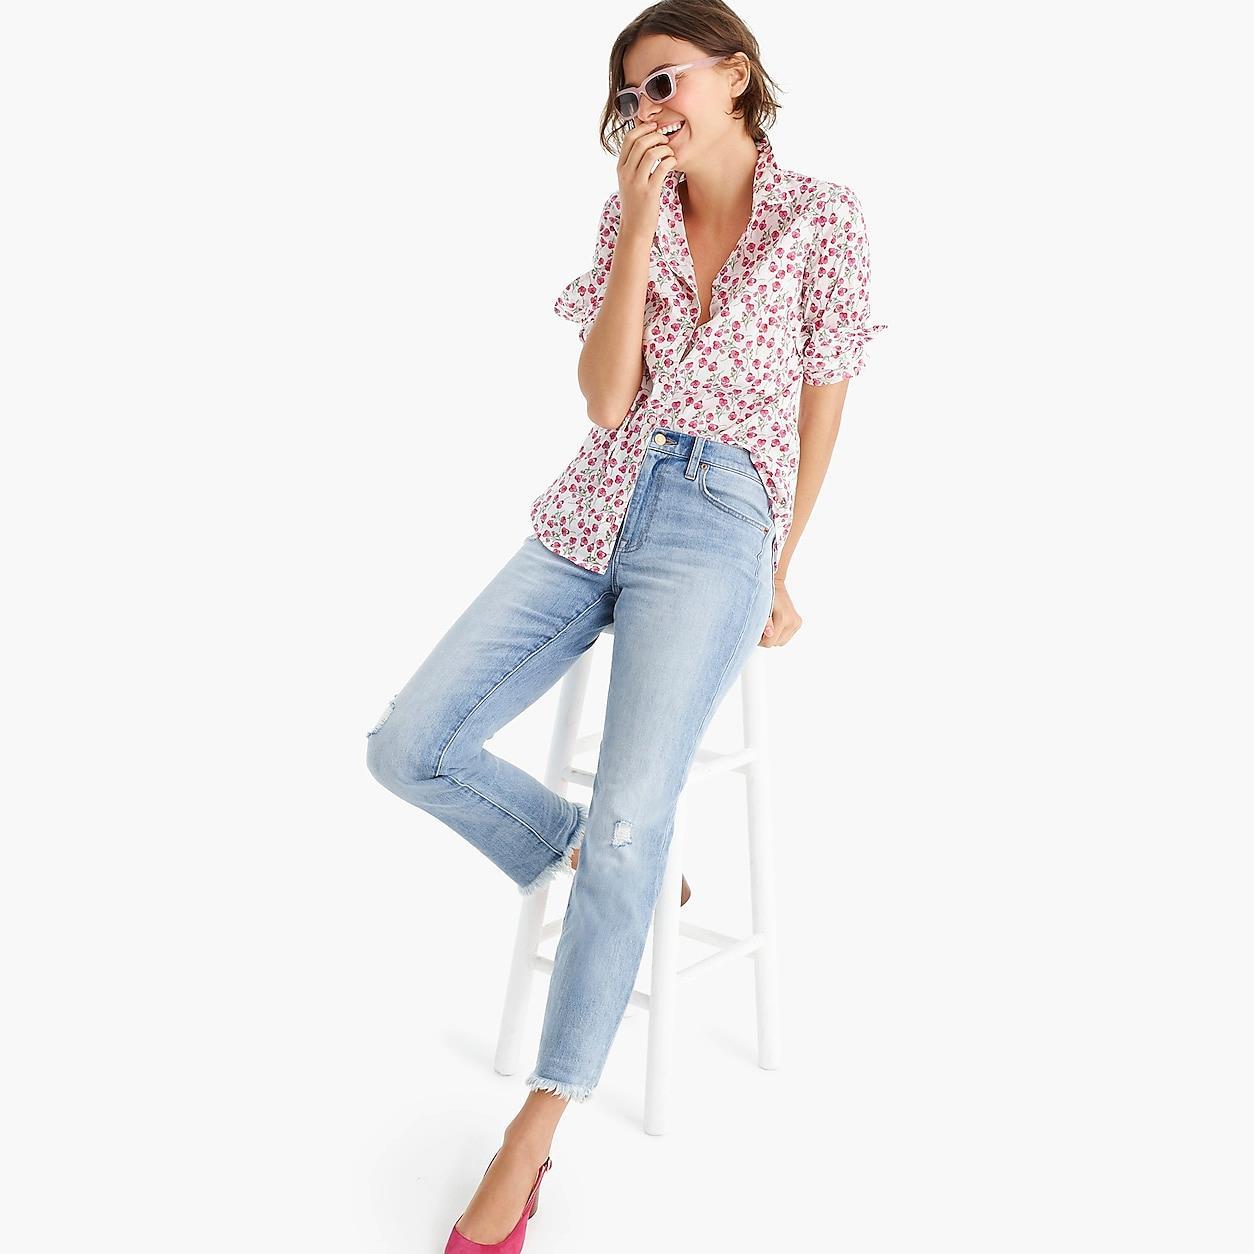 Slim Perfect Shirt In Liberty Floral